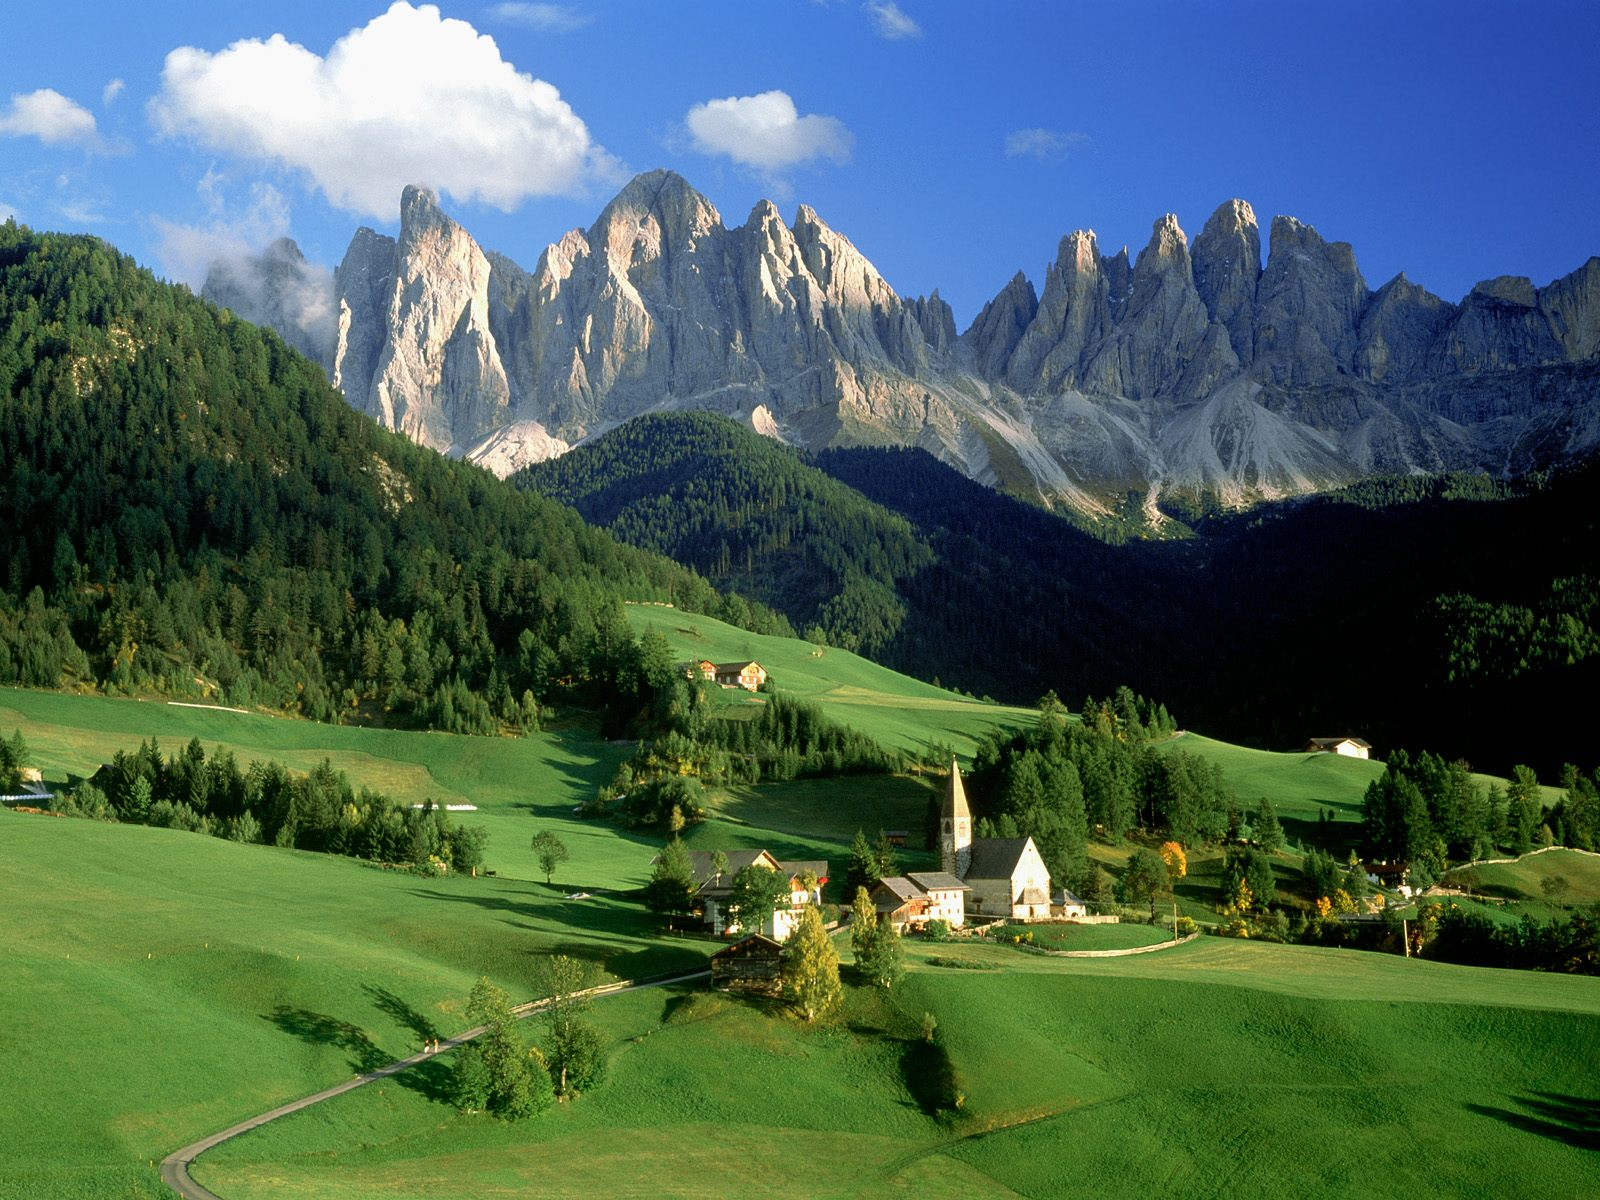 Val di Funes Dolomites Italy wallpaper